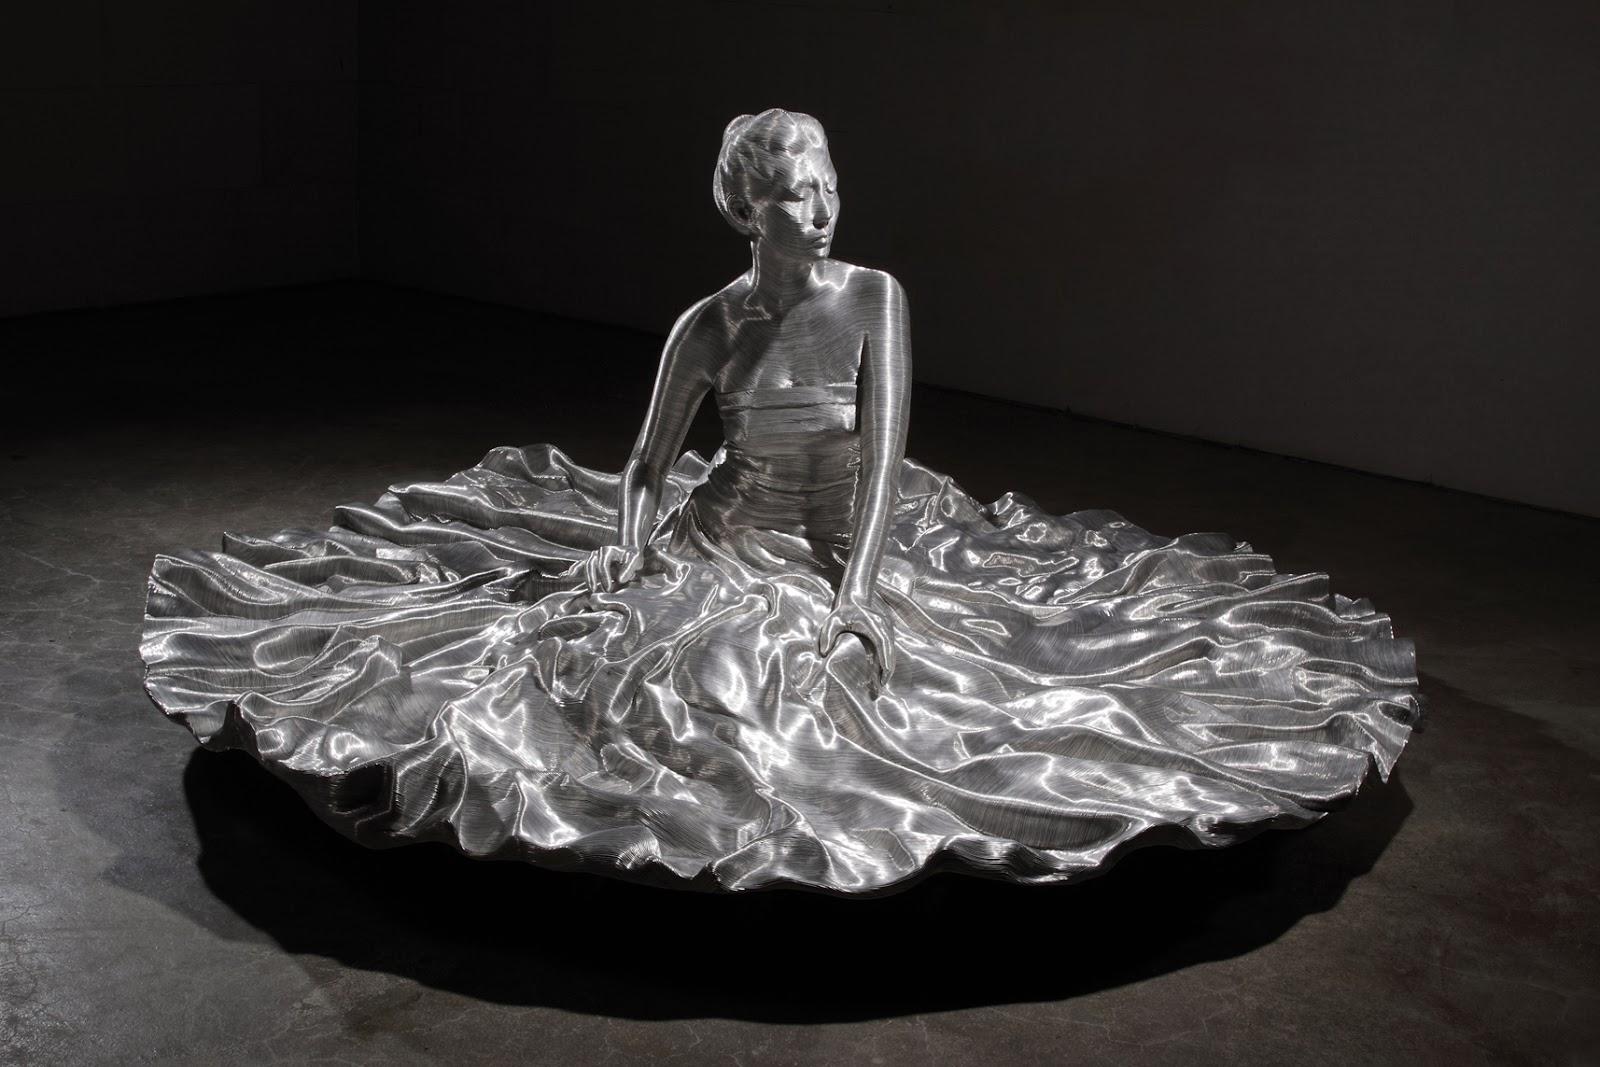 02-Park-Seung-Mo-South-Korean-Artist-&-Sculptor-Wire-Sculpture-www-designstack-co